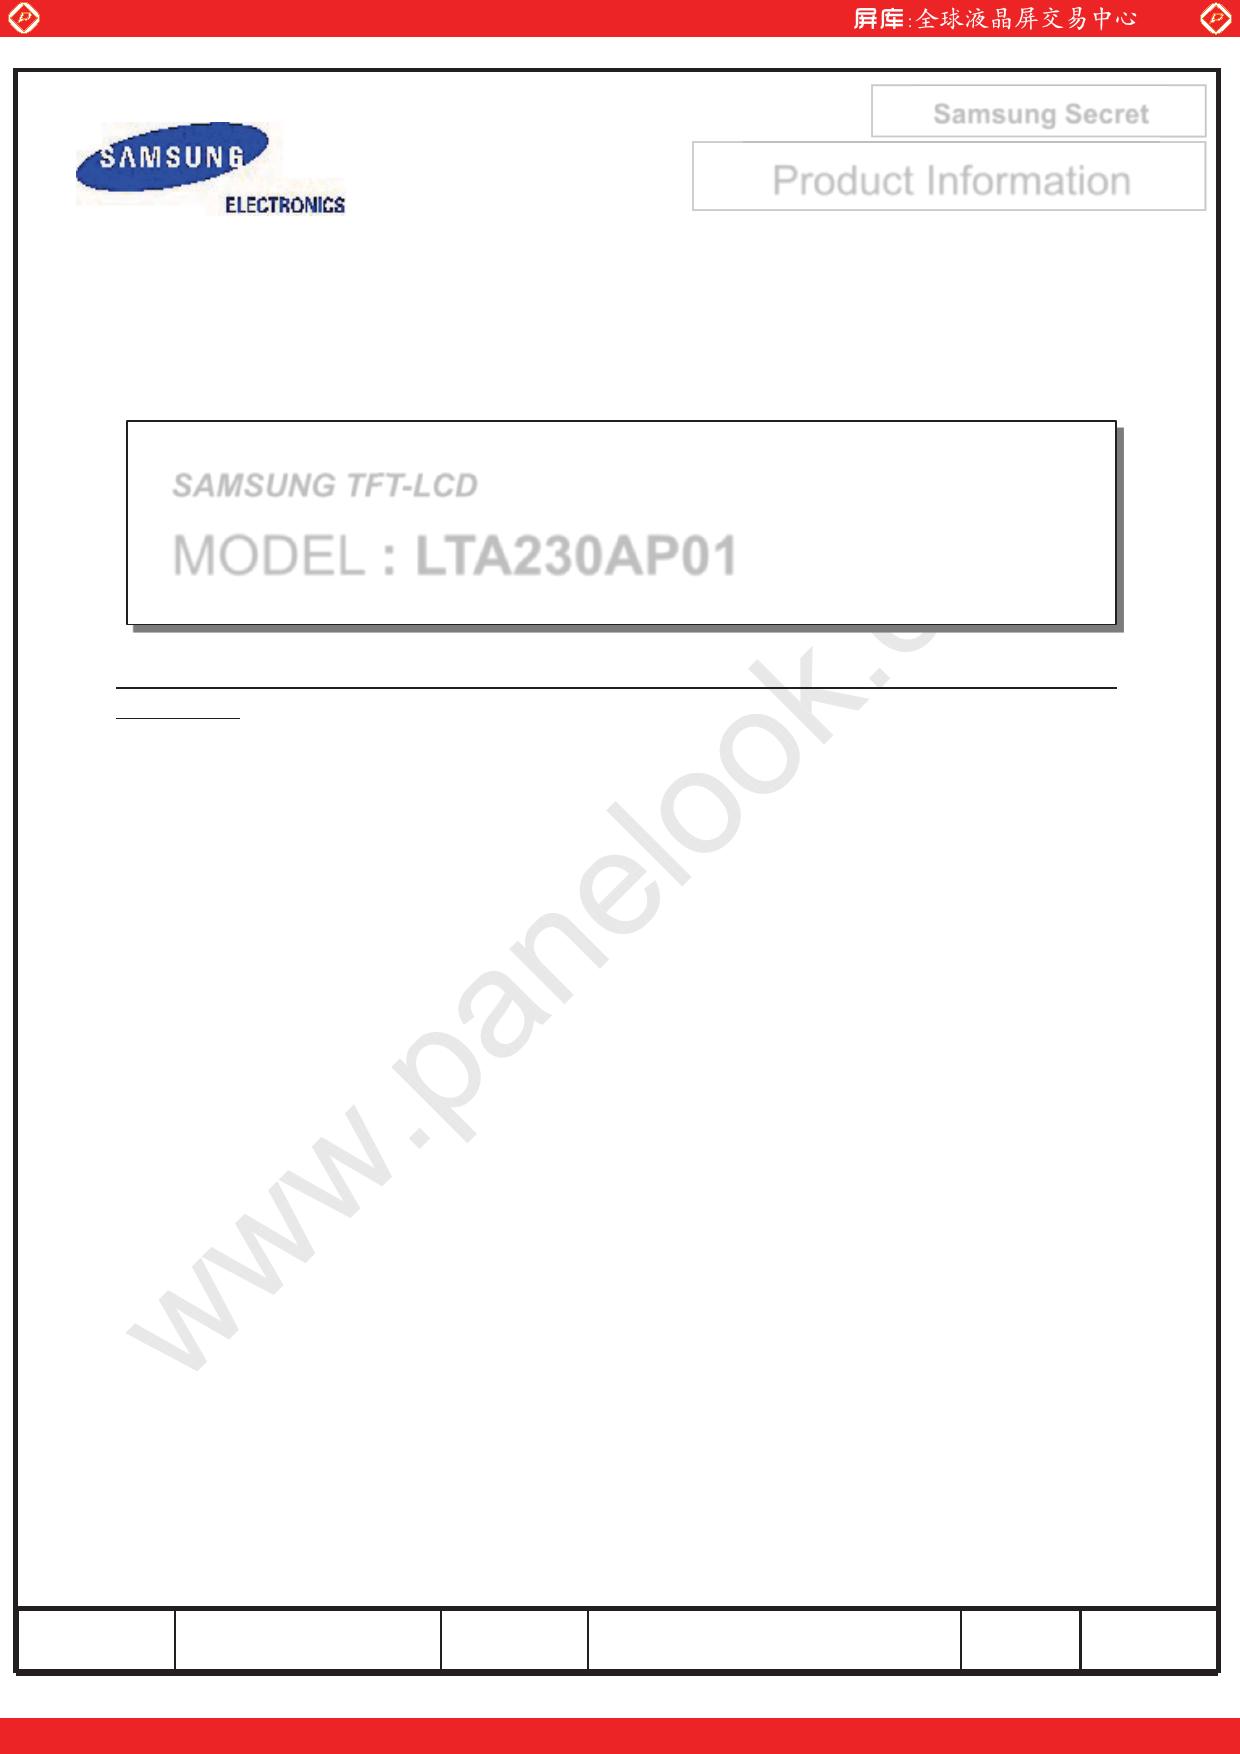 LTA230AP01 image